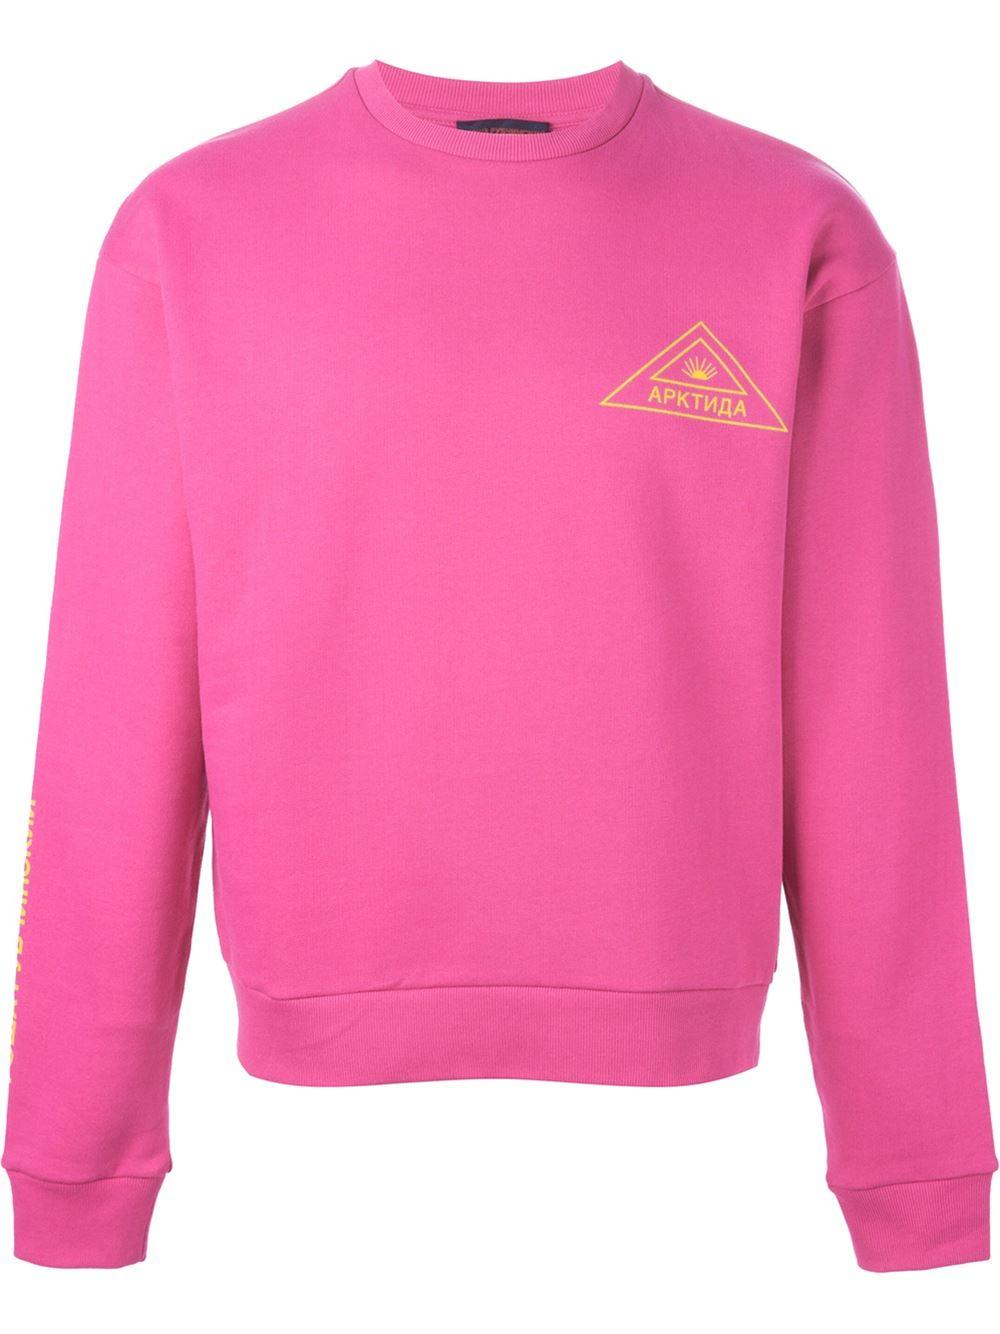 best service 1366e 3fcfe gosha rubchinskiy split sweatshirt lyst gosha rubchinskiy printed logo  sweatshirt in pink